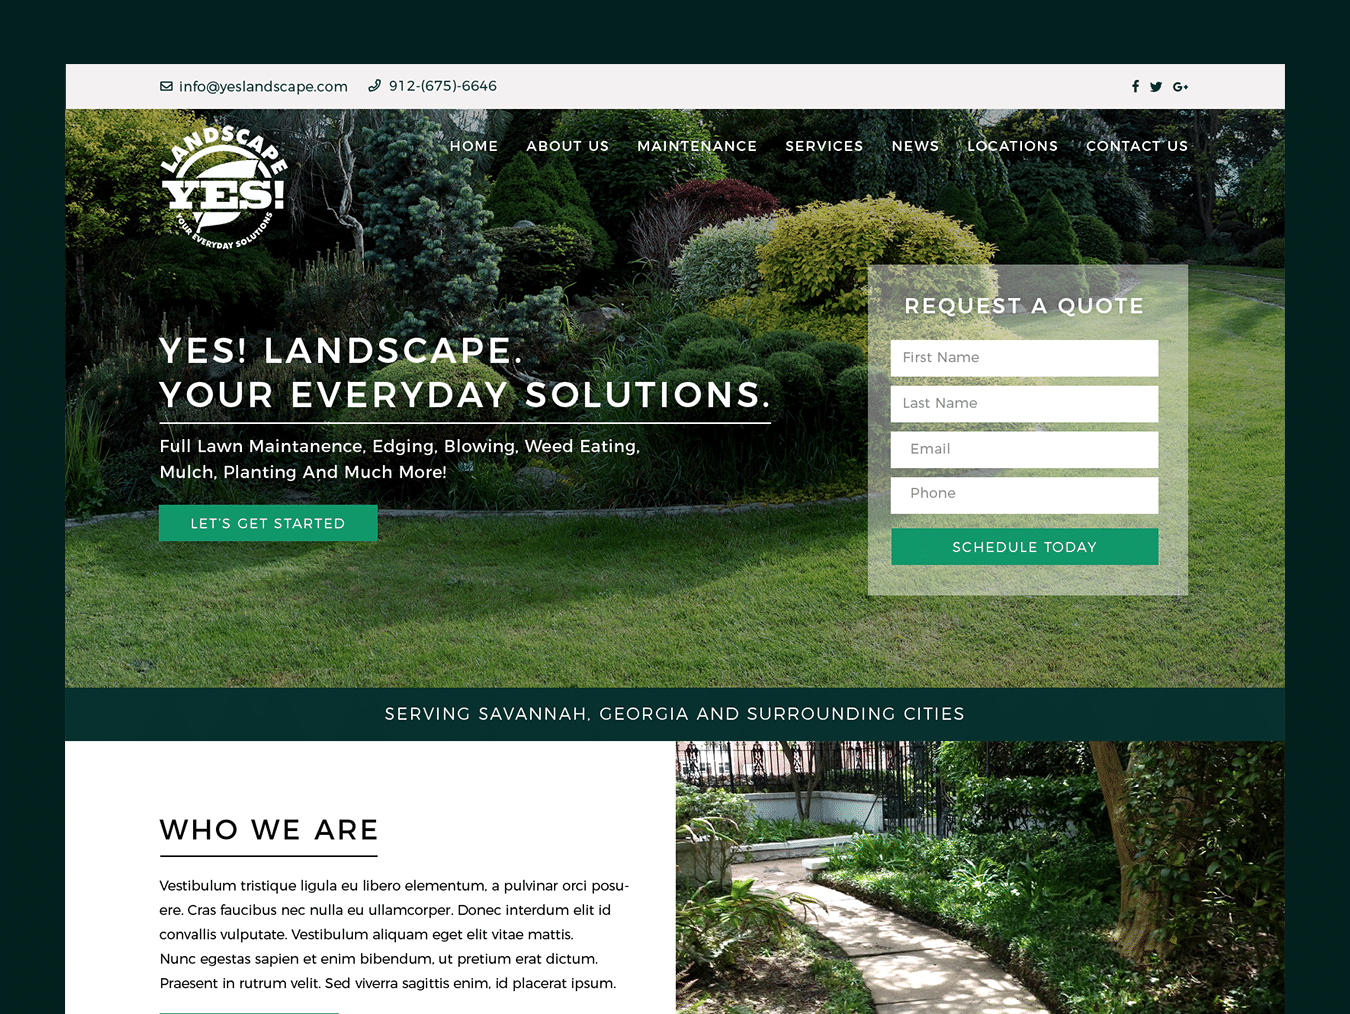 service-company-web-design-yes-landscape-thumbnail-design